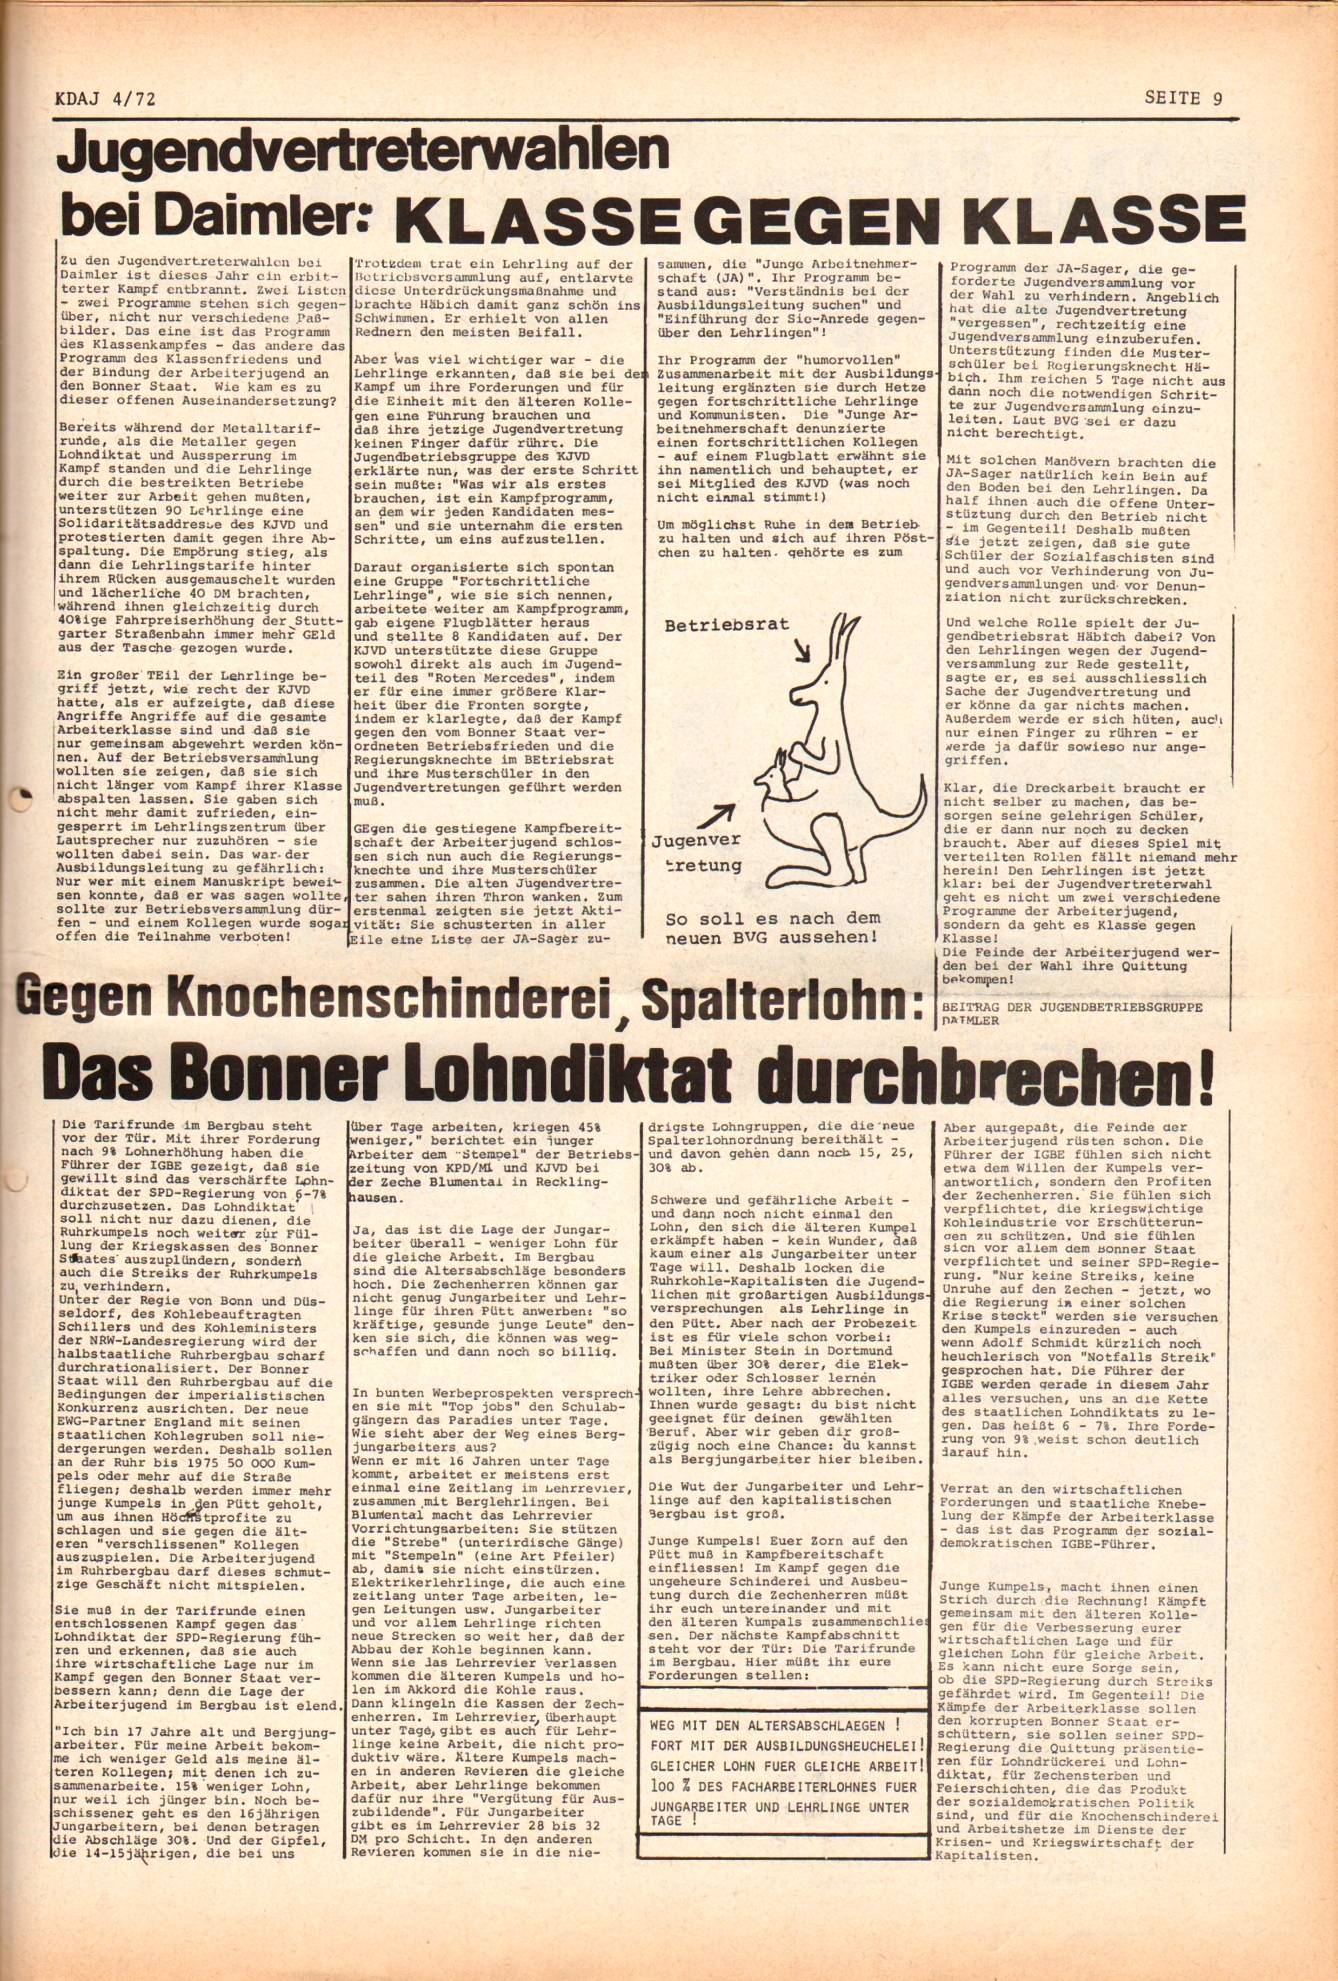 KDAJ, 3. Jg., Mai 1972, Nr. 4, Seite 9